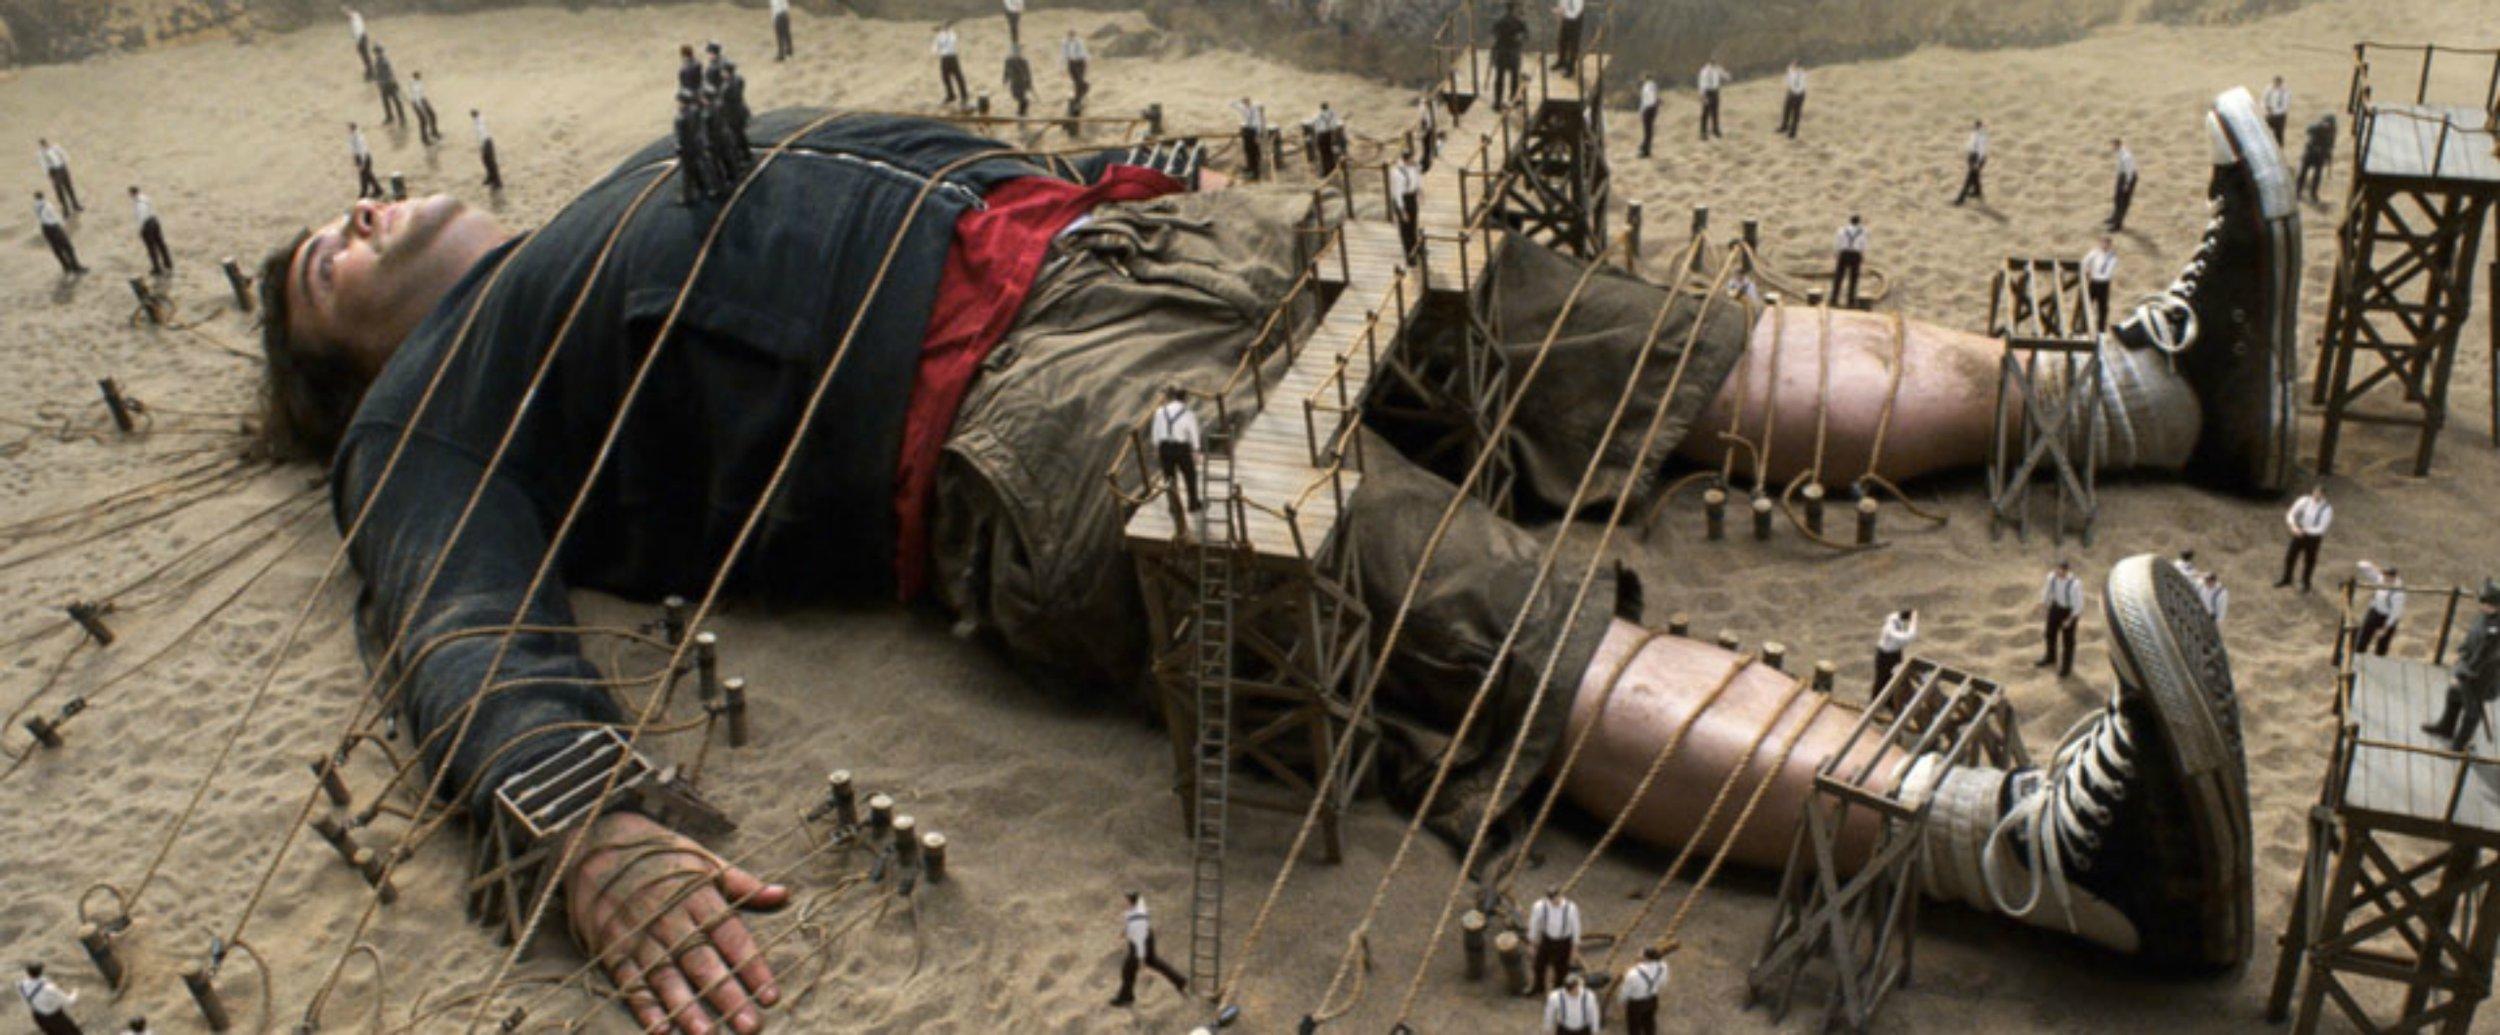 Jack Black in Gulliver's Travels (20th Century Fox)